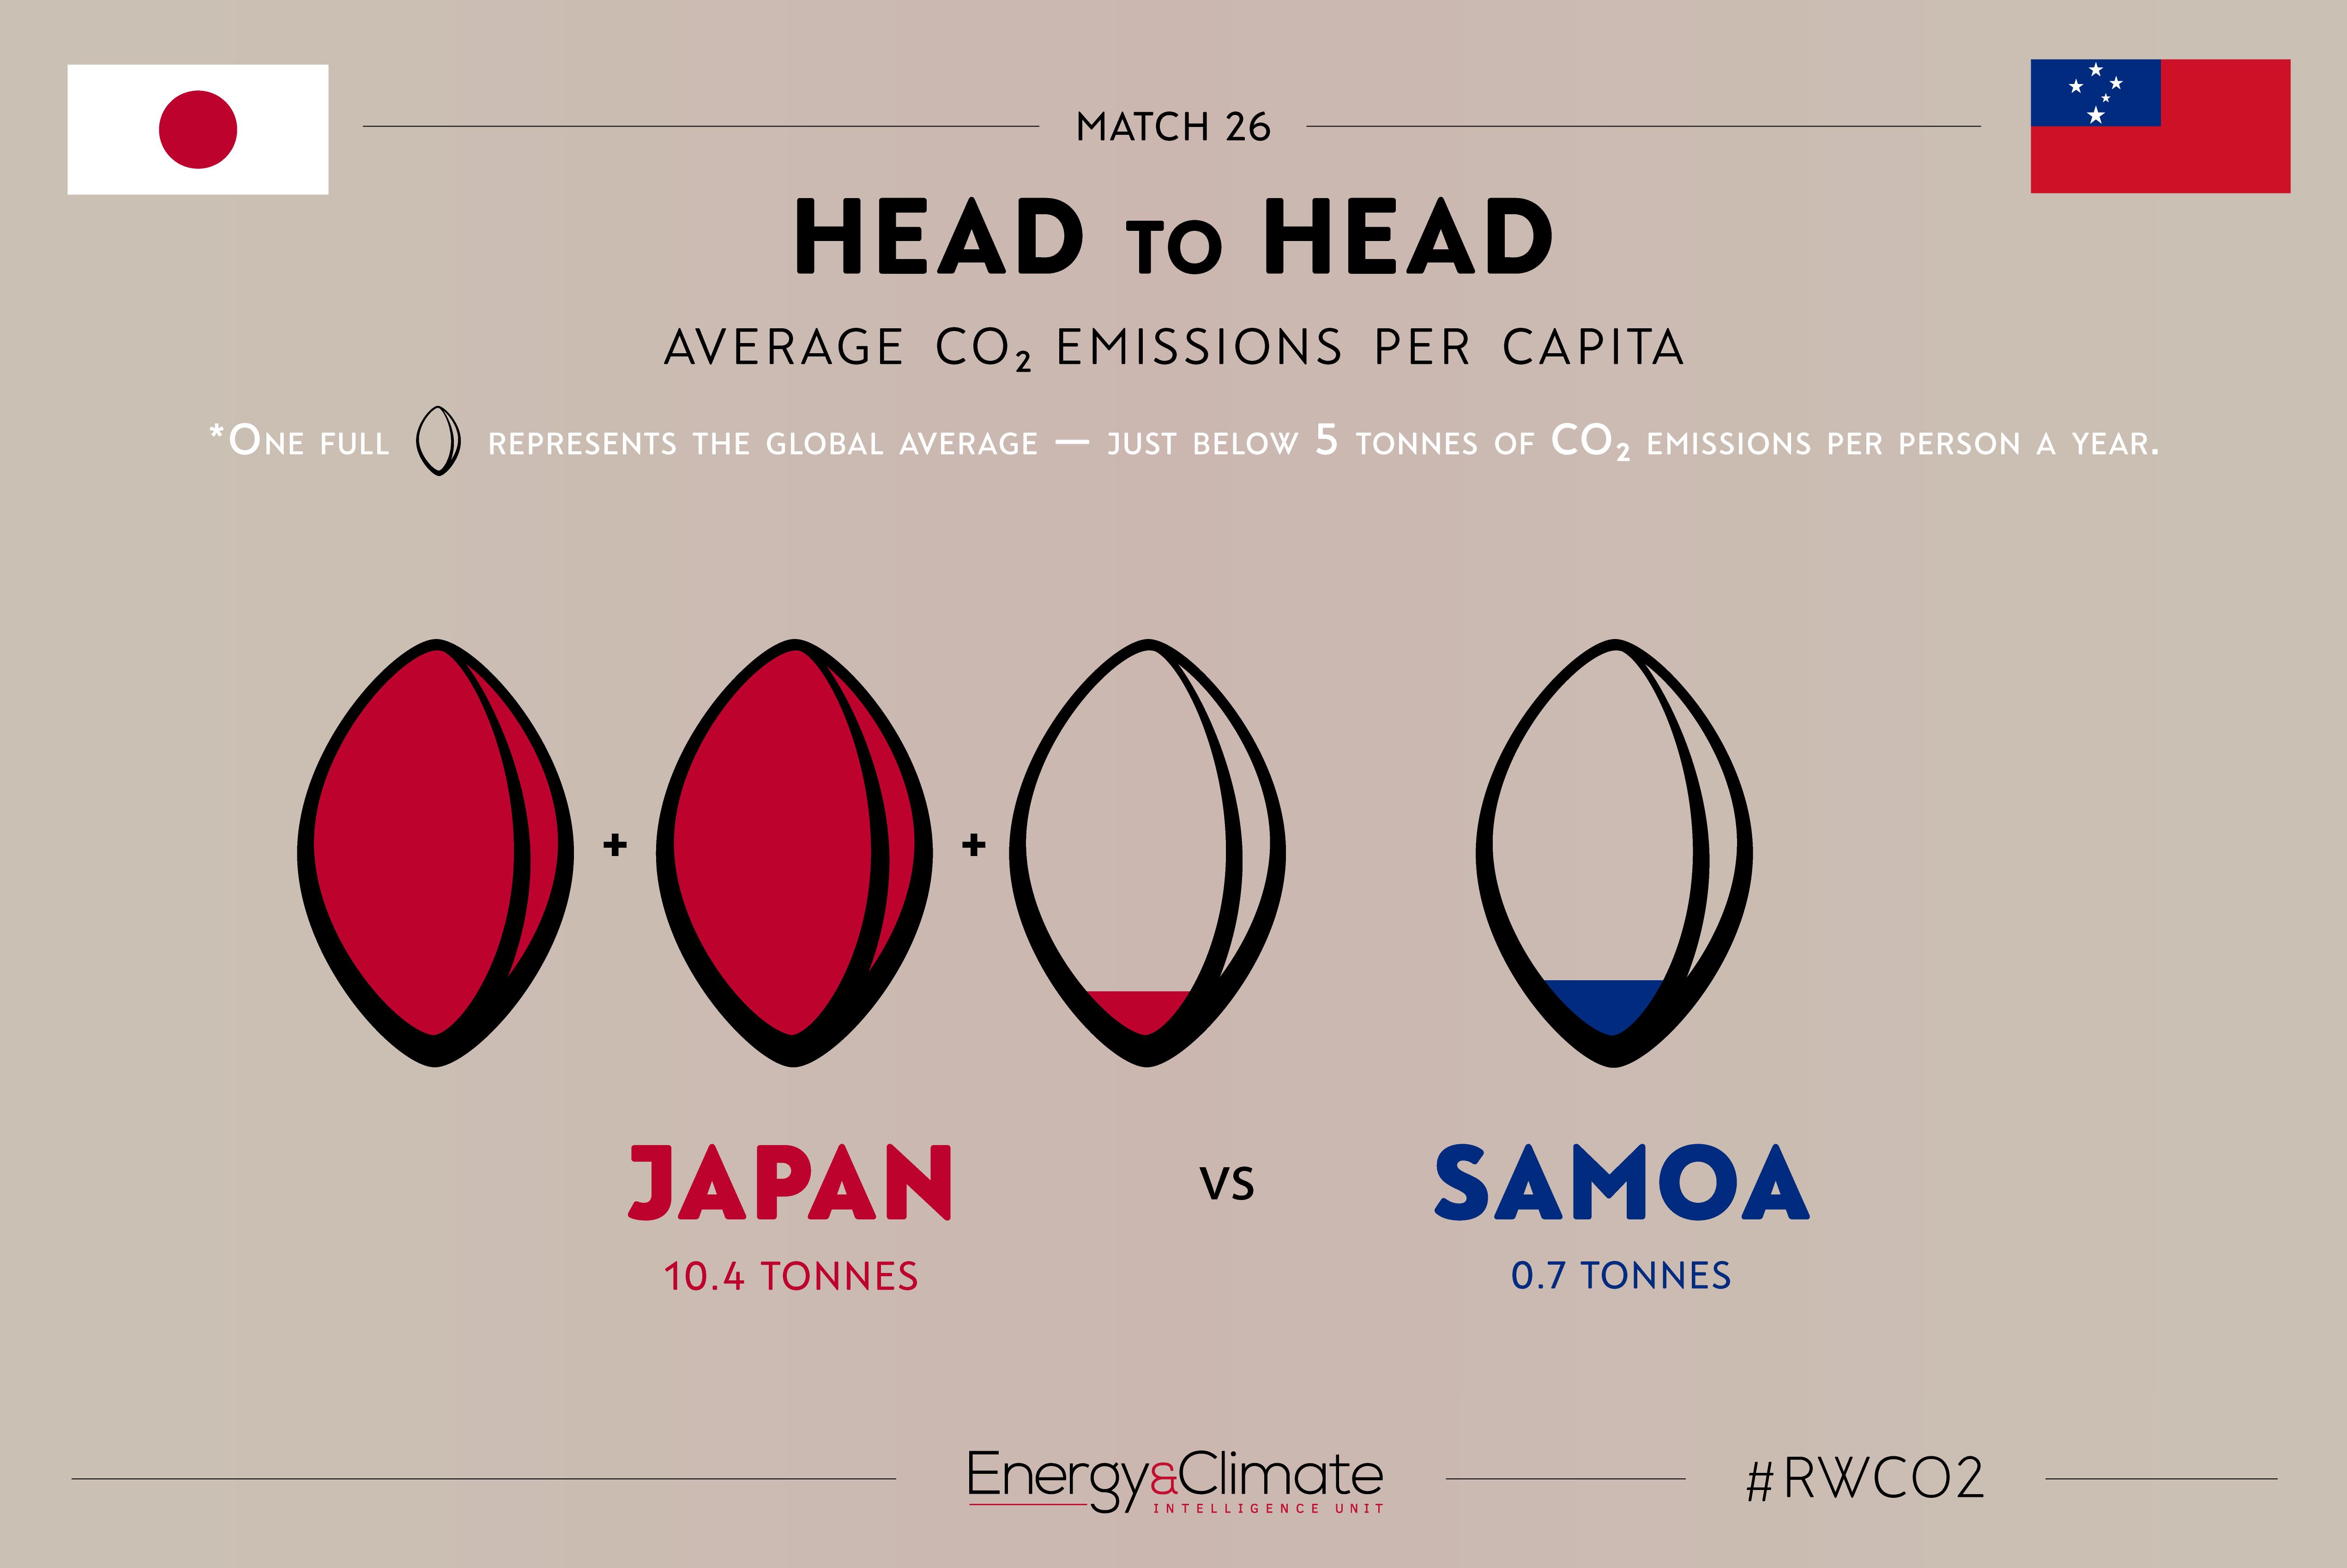 Japan v Samoa per capita emissions